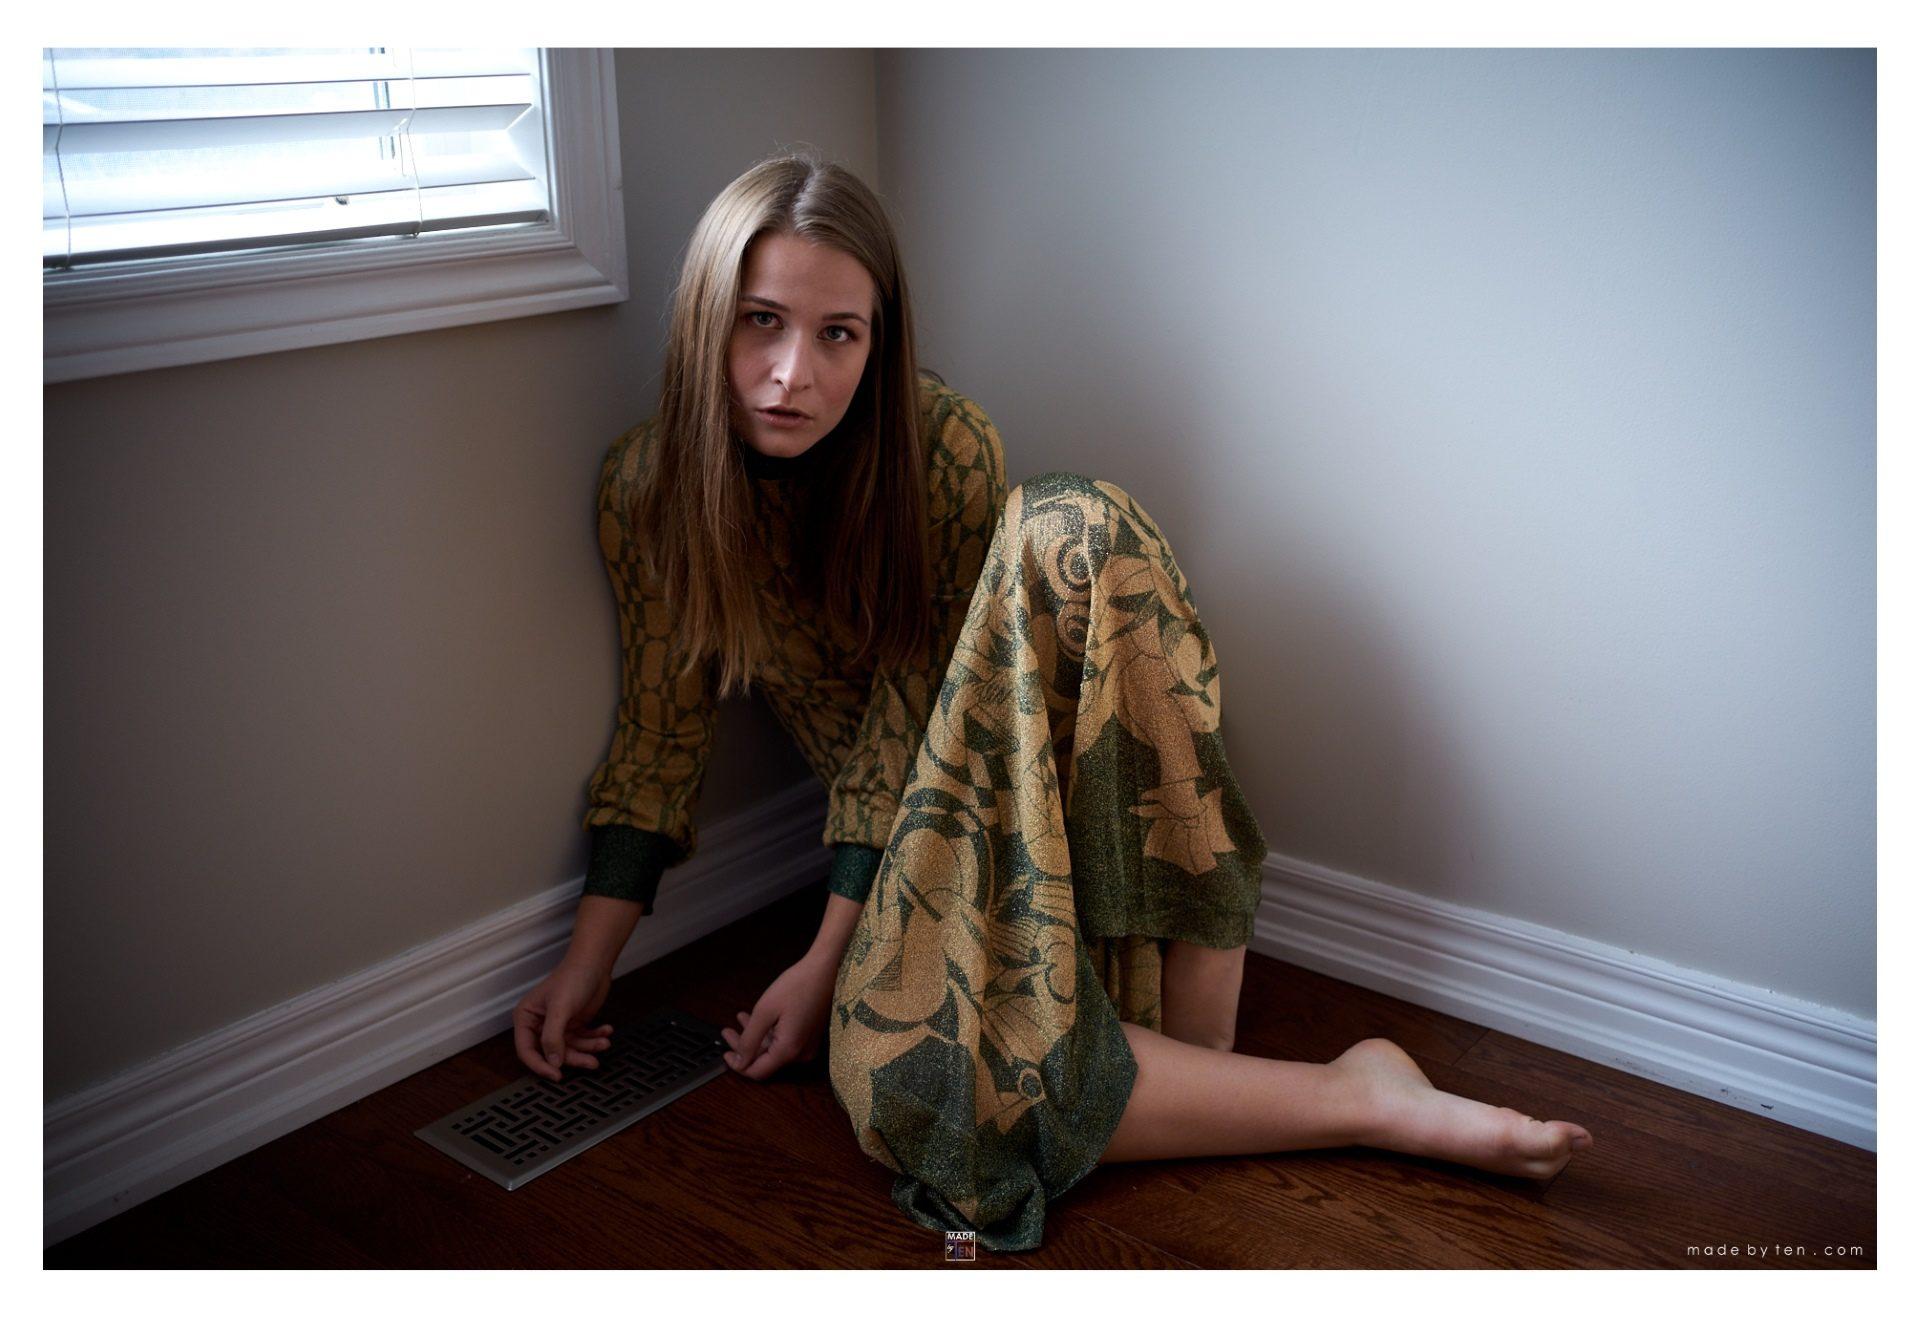 Pose 3 - GTA Women Art Photography